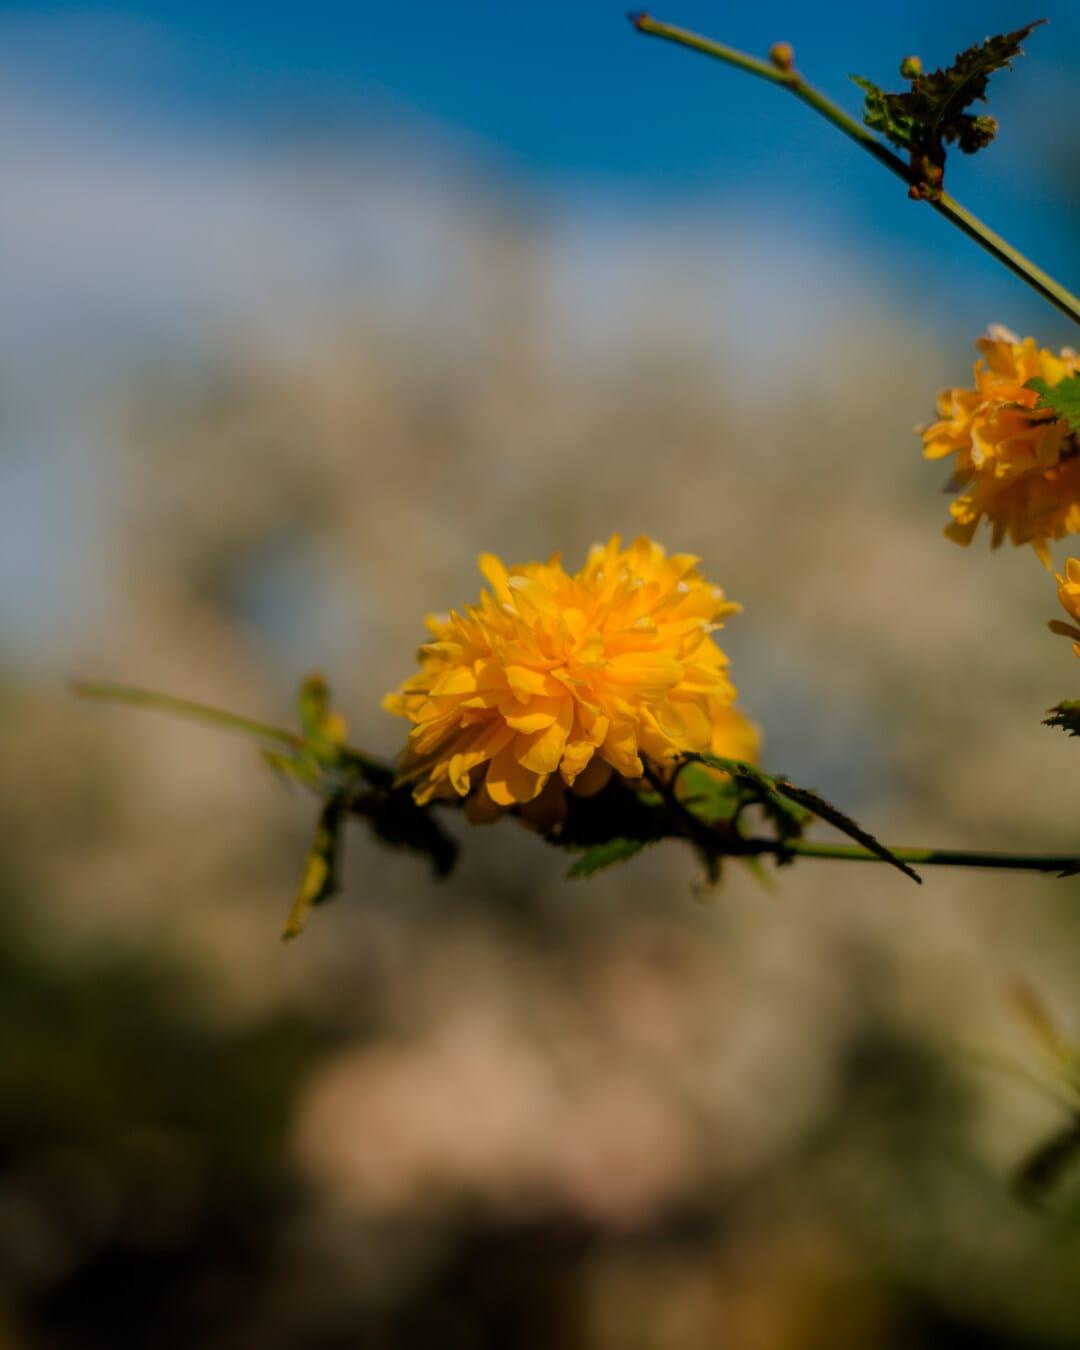 fleurs, jaune orangé, printemps, branches, arbuste, plante, flore, Jaune, herbe, nature